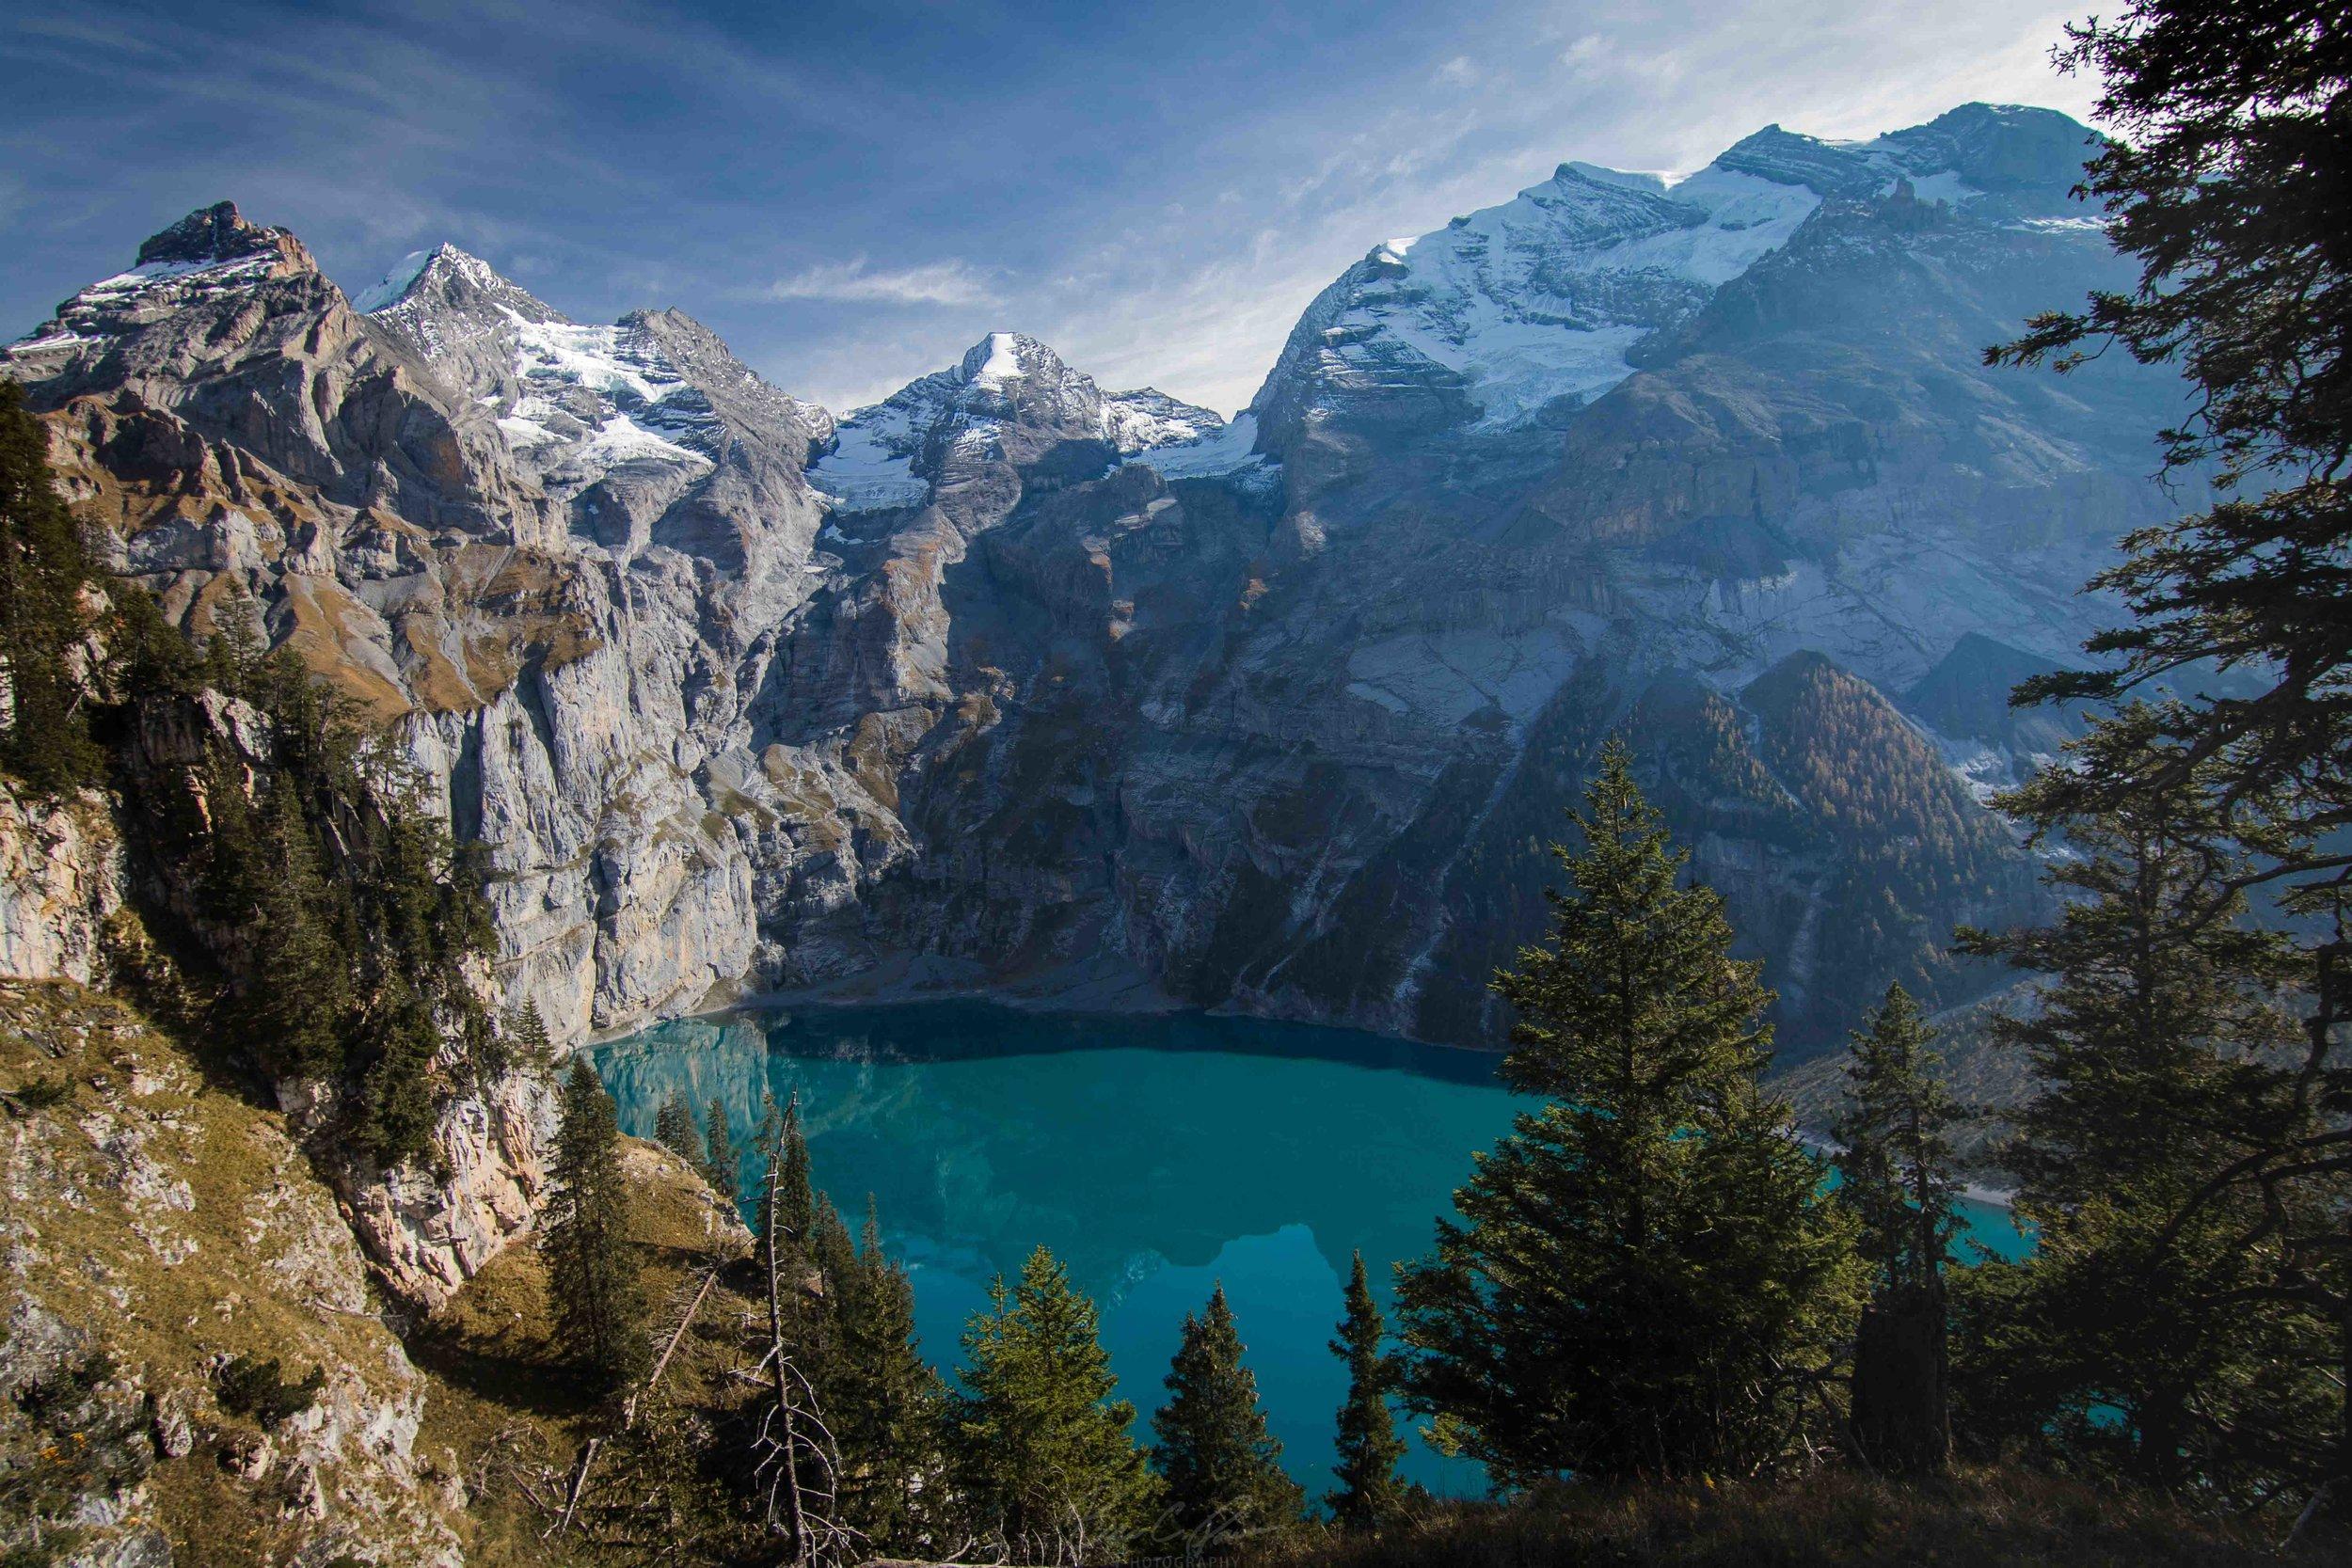 Tranquil Oeschinen Lake in Bernese Oberland Switzerland